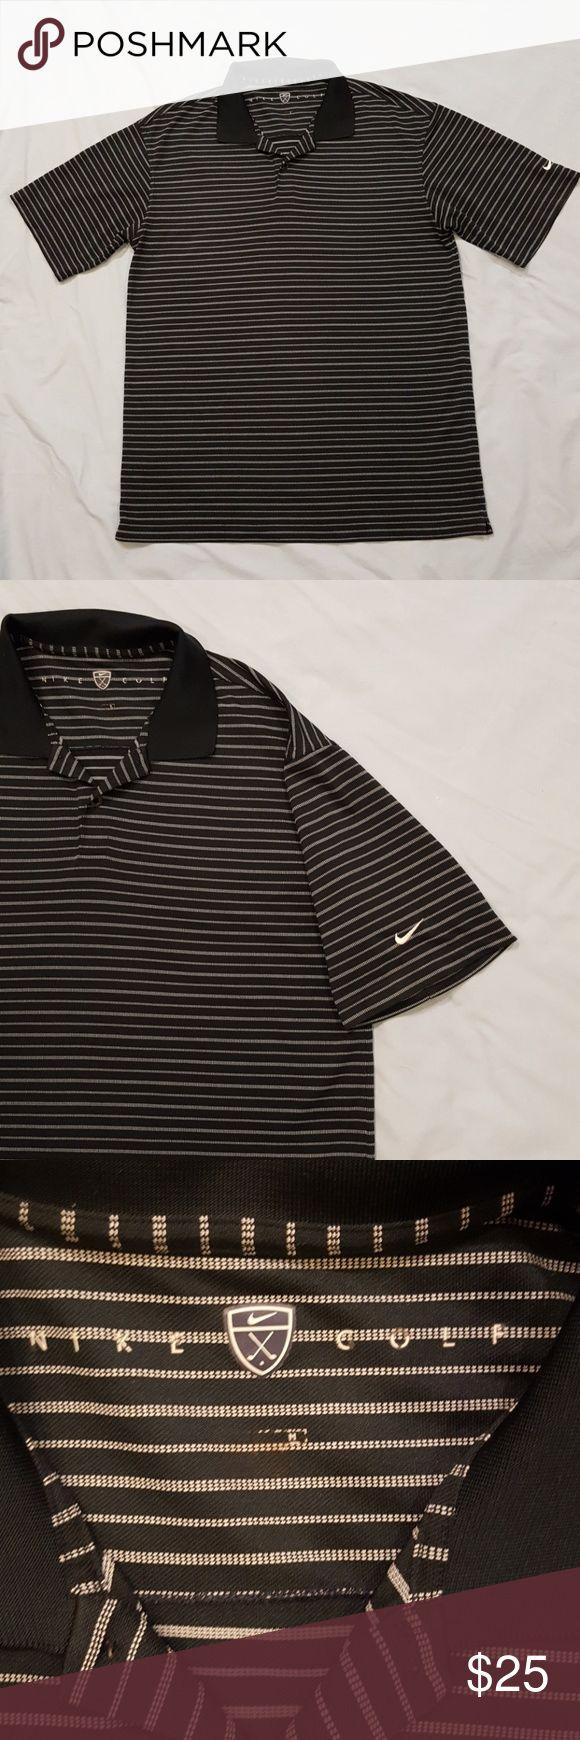 Nike polo shirt Black and white striped golf shirt, black collar Nike Shirts Polos